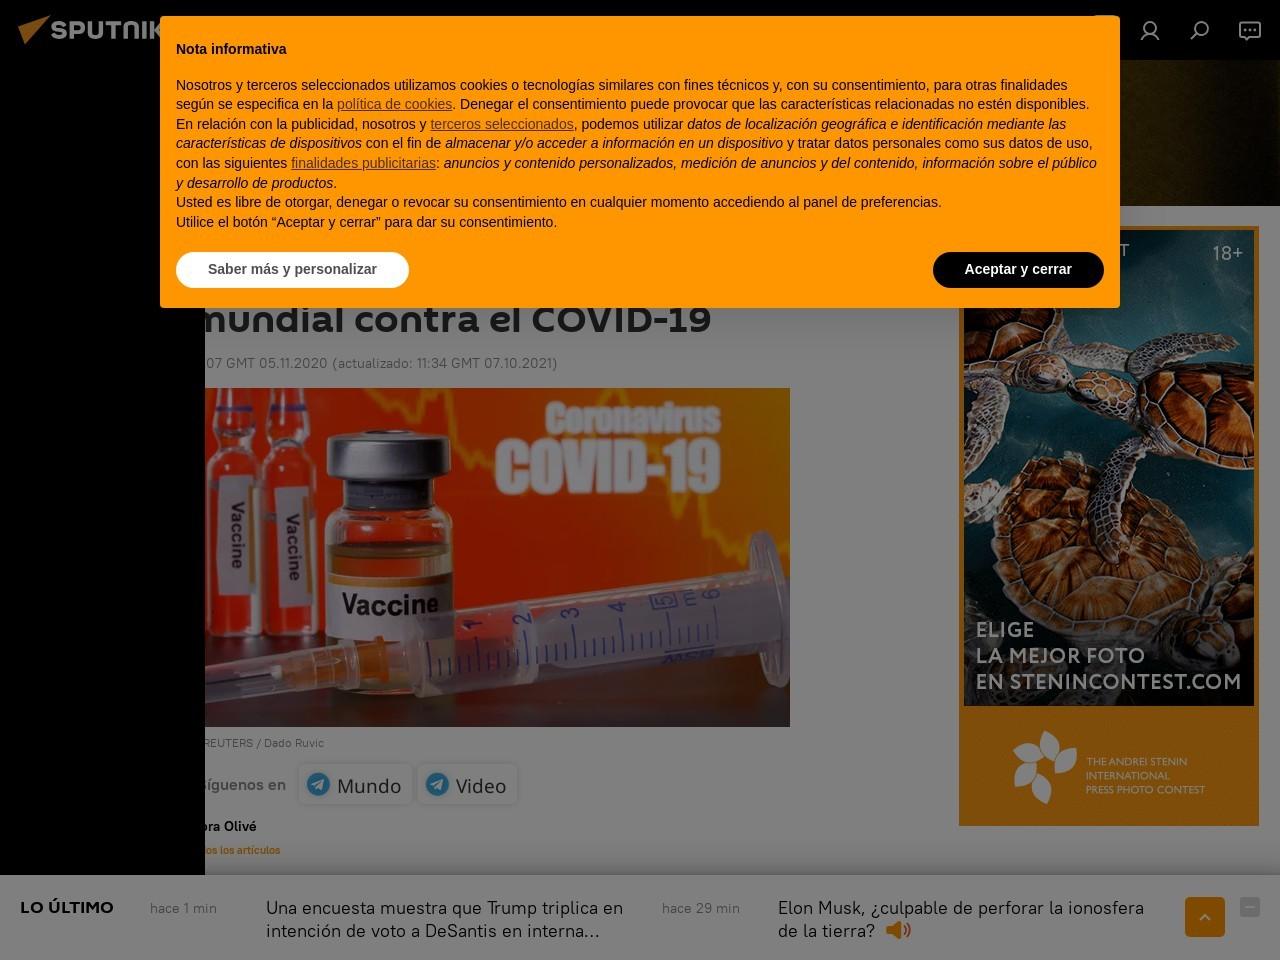 RUTI: la primera vacuna española que salta a la lucha mundial contra el COVID-19